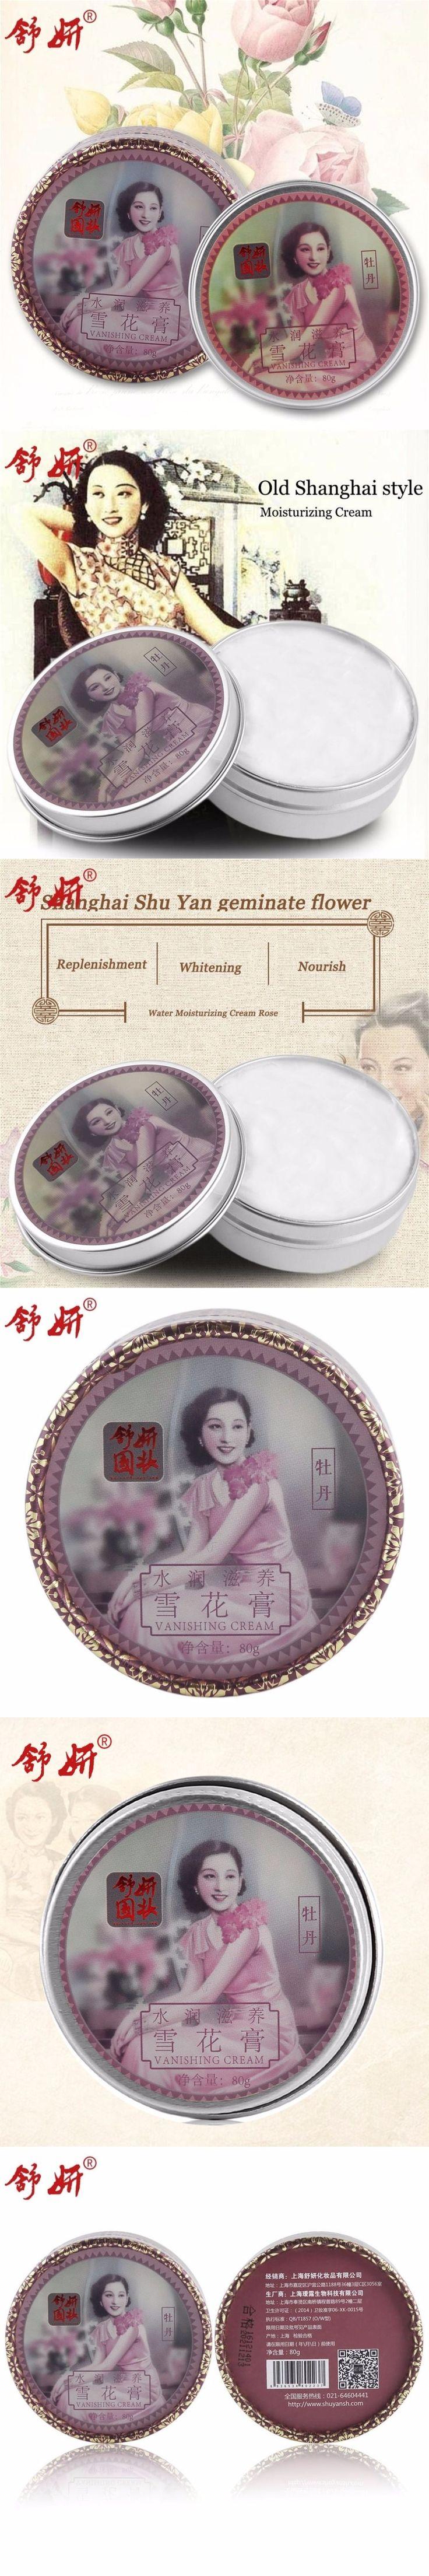 ShuYan Brand Face cream skin care ssential oil whitening cream skin whitening moisturizing face cream cosmetic snow white #facecreamsmoisturizing